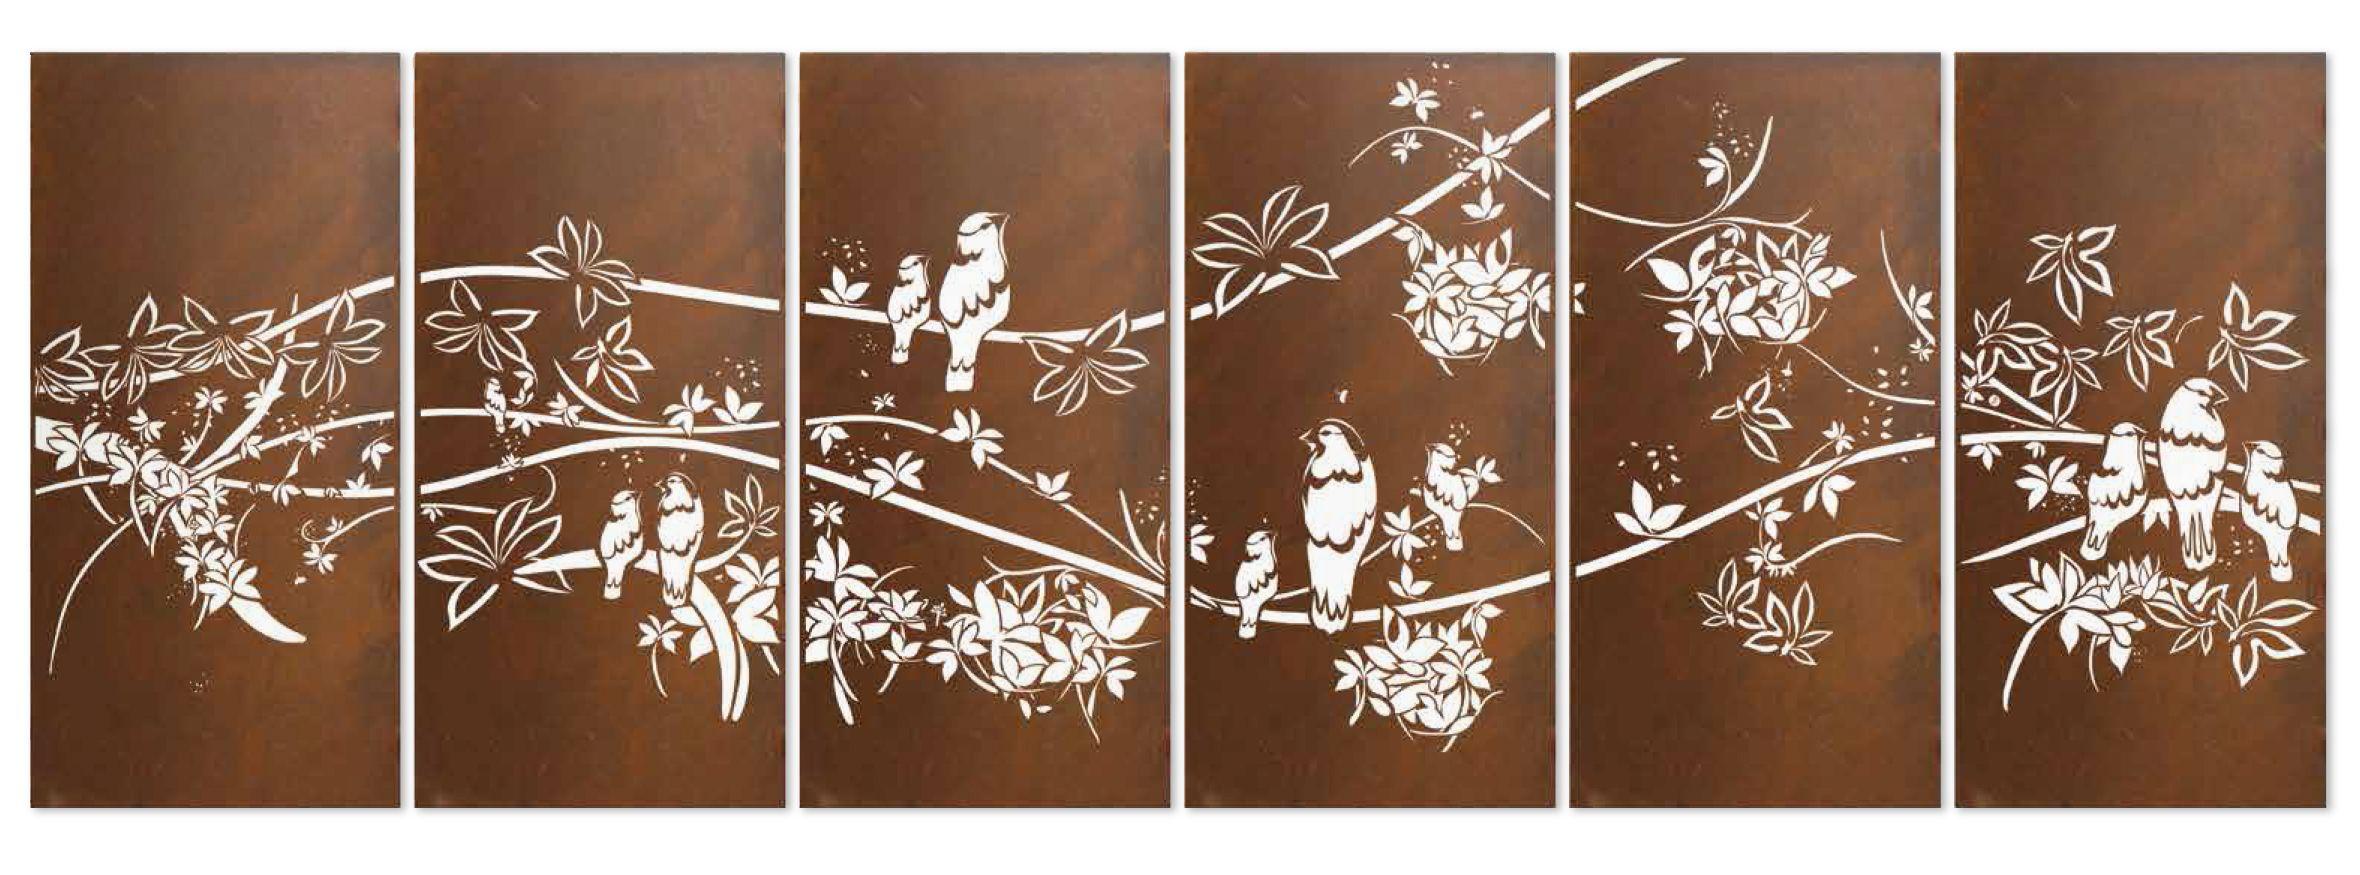 Tropical birdsu outdoor decorative garden screening by entanglements